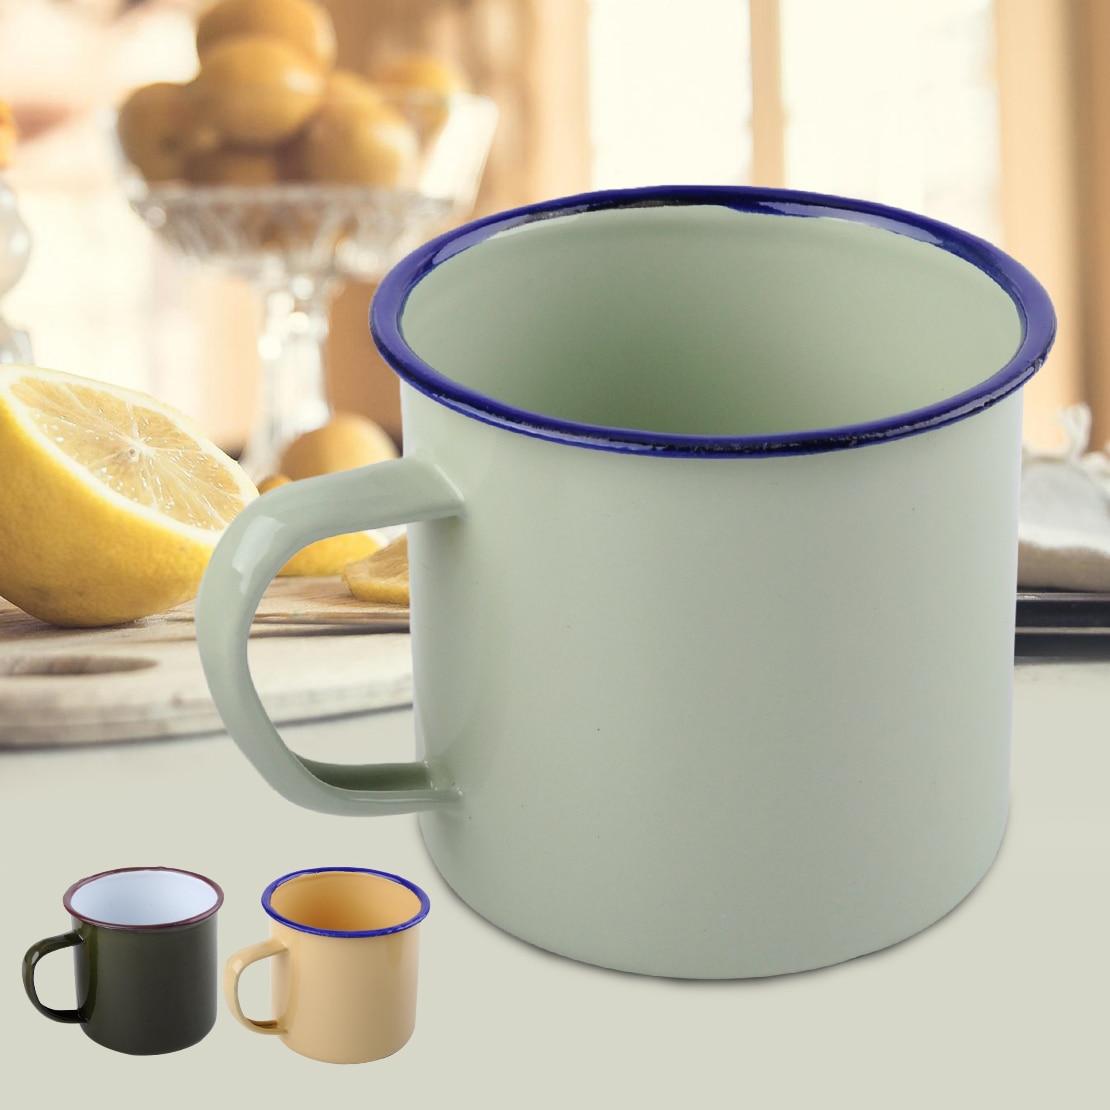 Taza de esmalte hecha a mano Estilo Vintage para beber café, oso, té, Camping, senderismo, regalo, 8cm